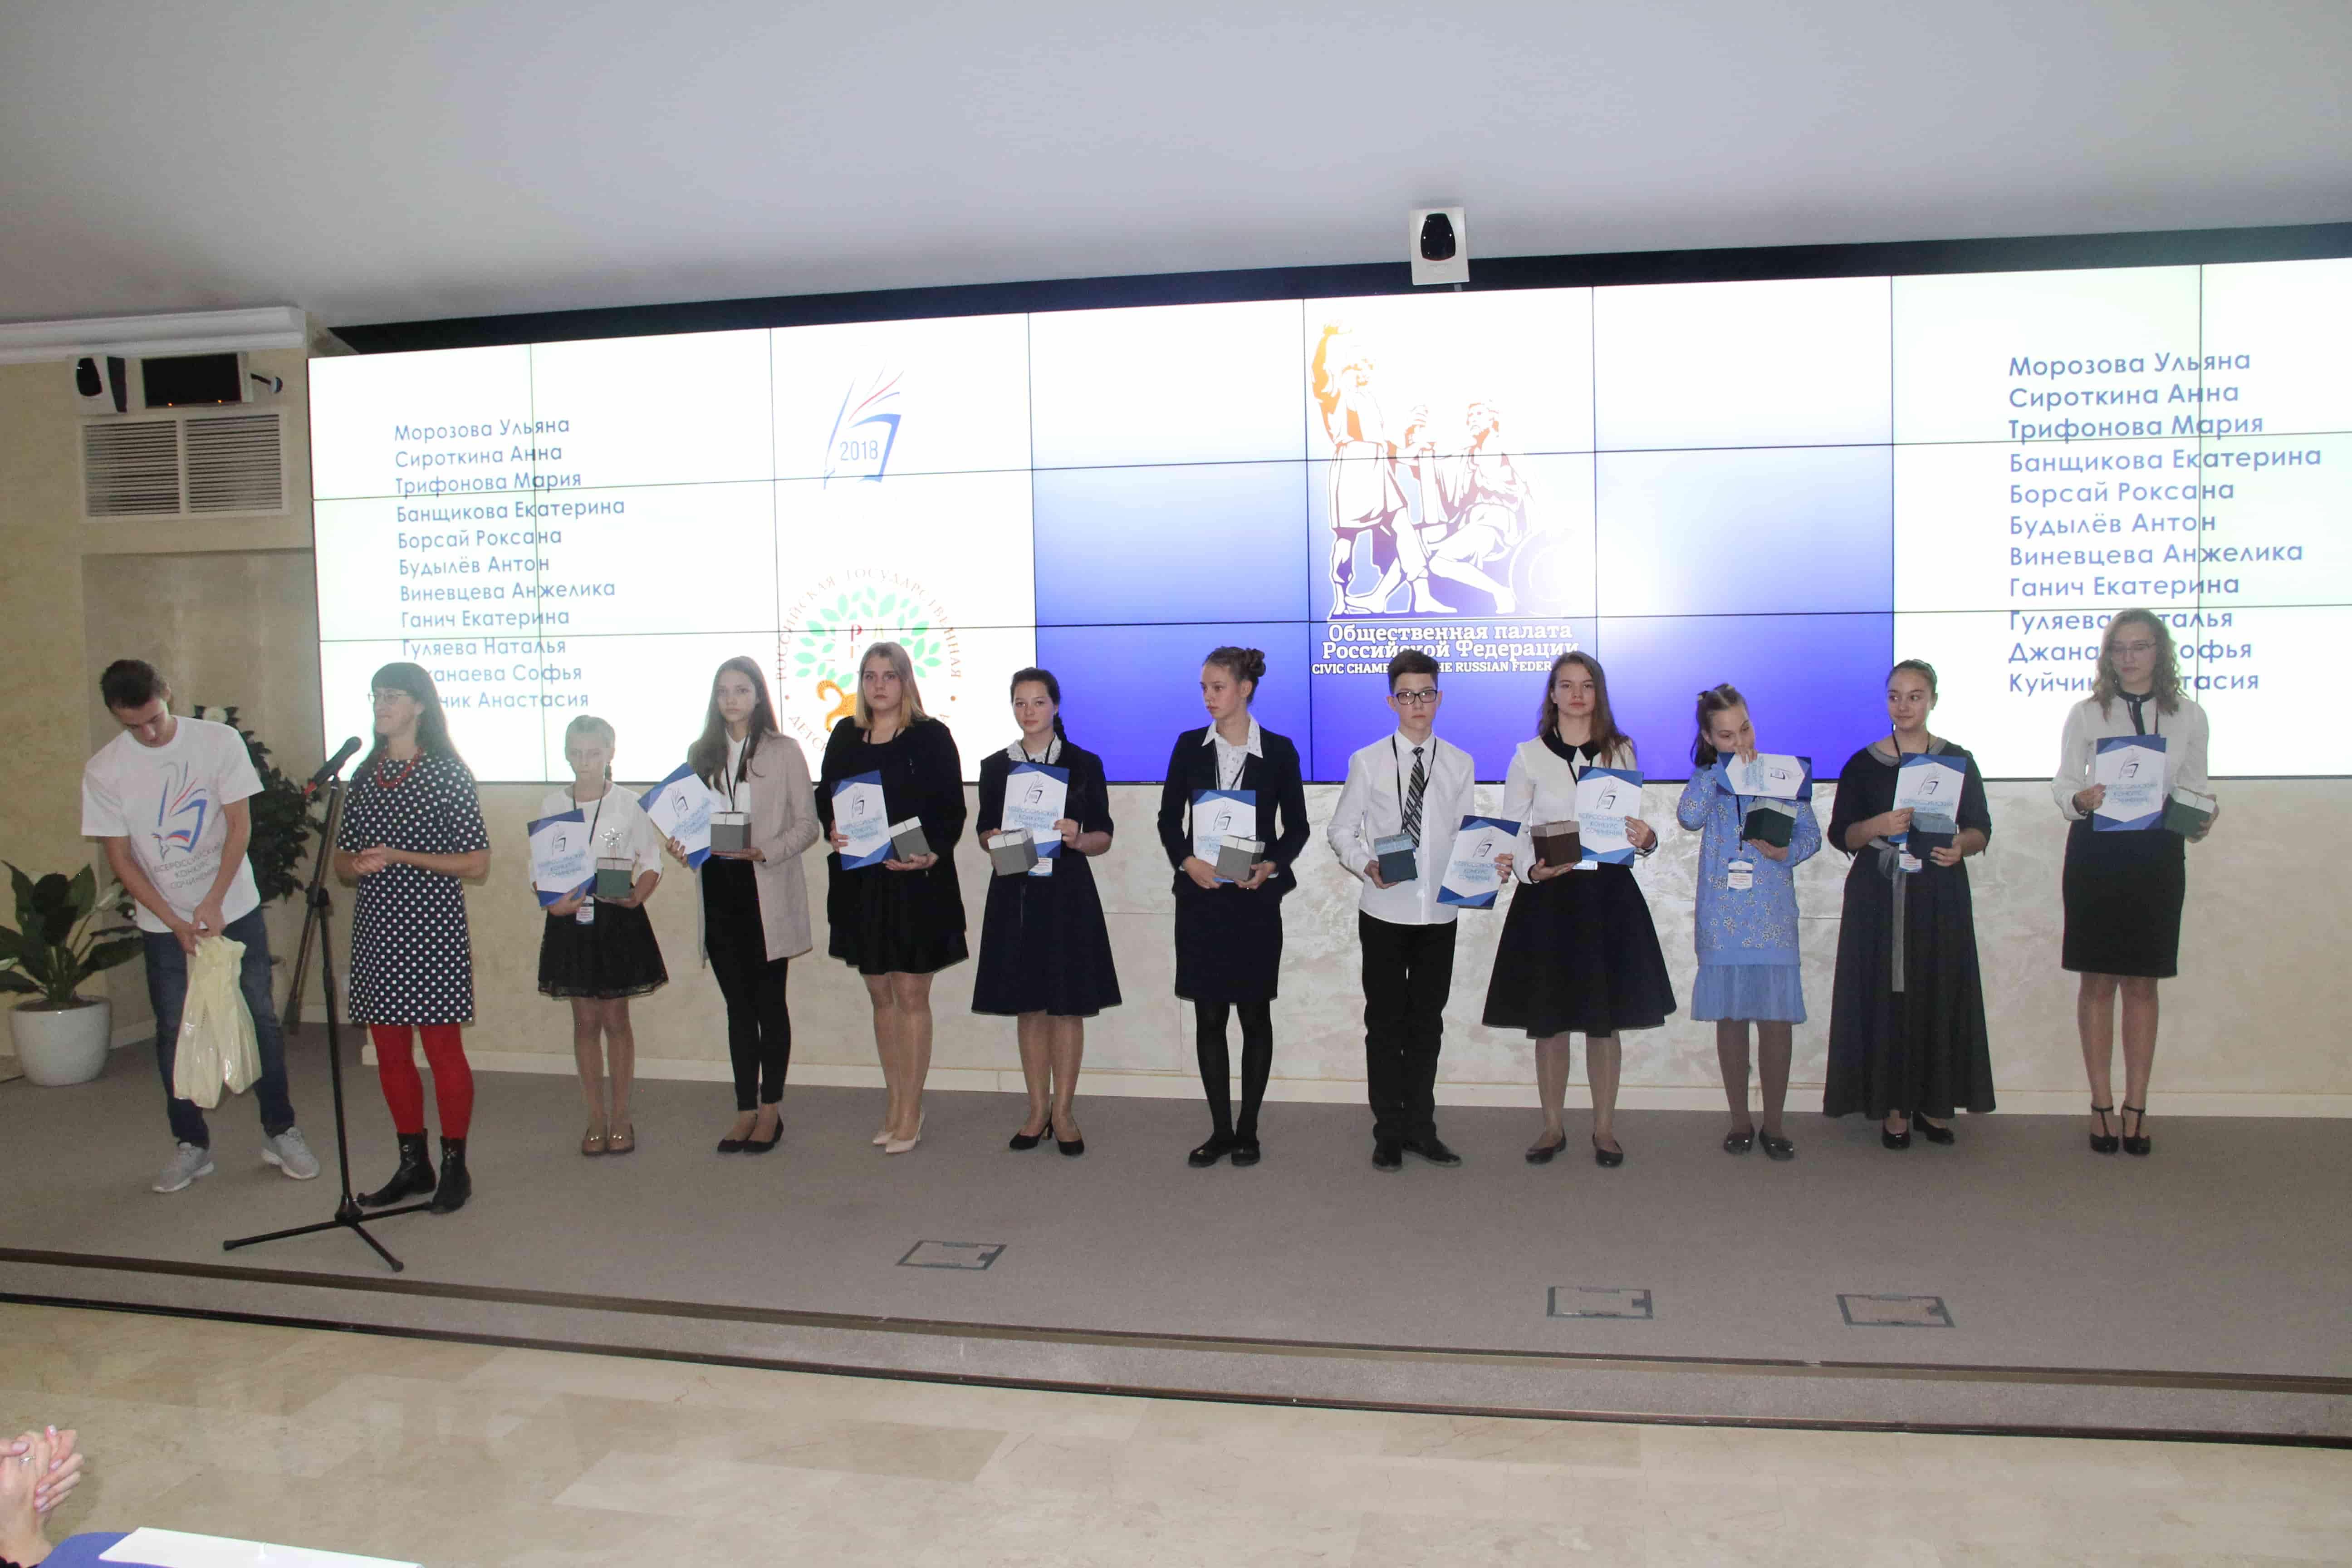 Sredi-finalistov-Banshhikova-Ekaterina